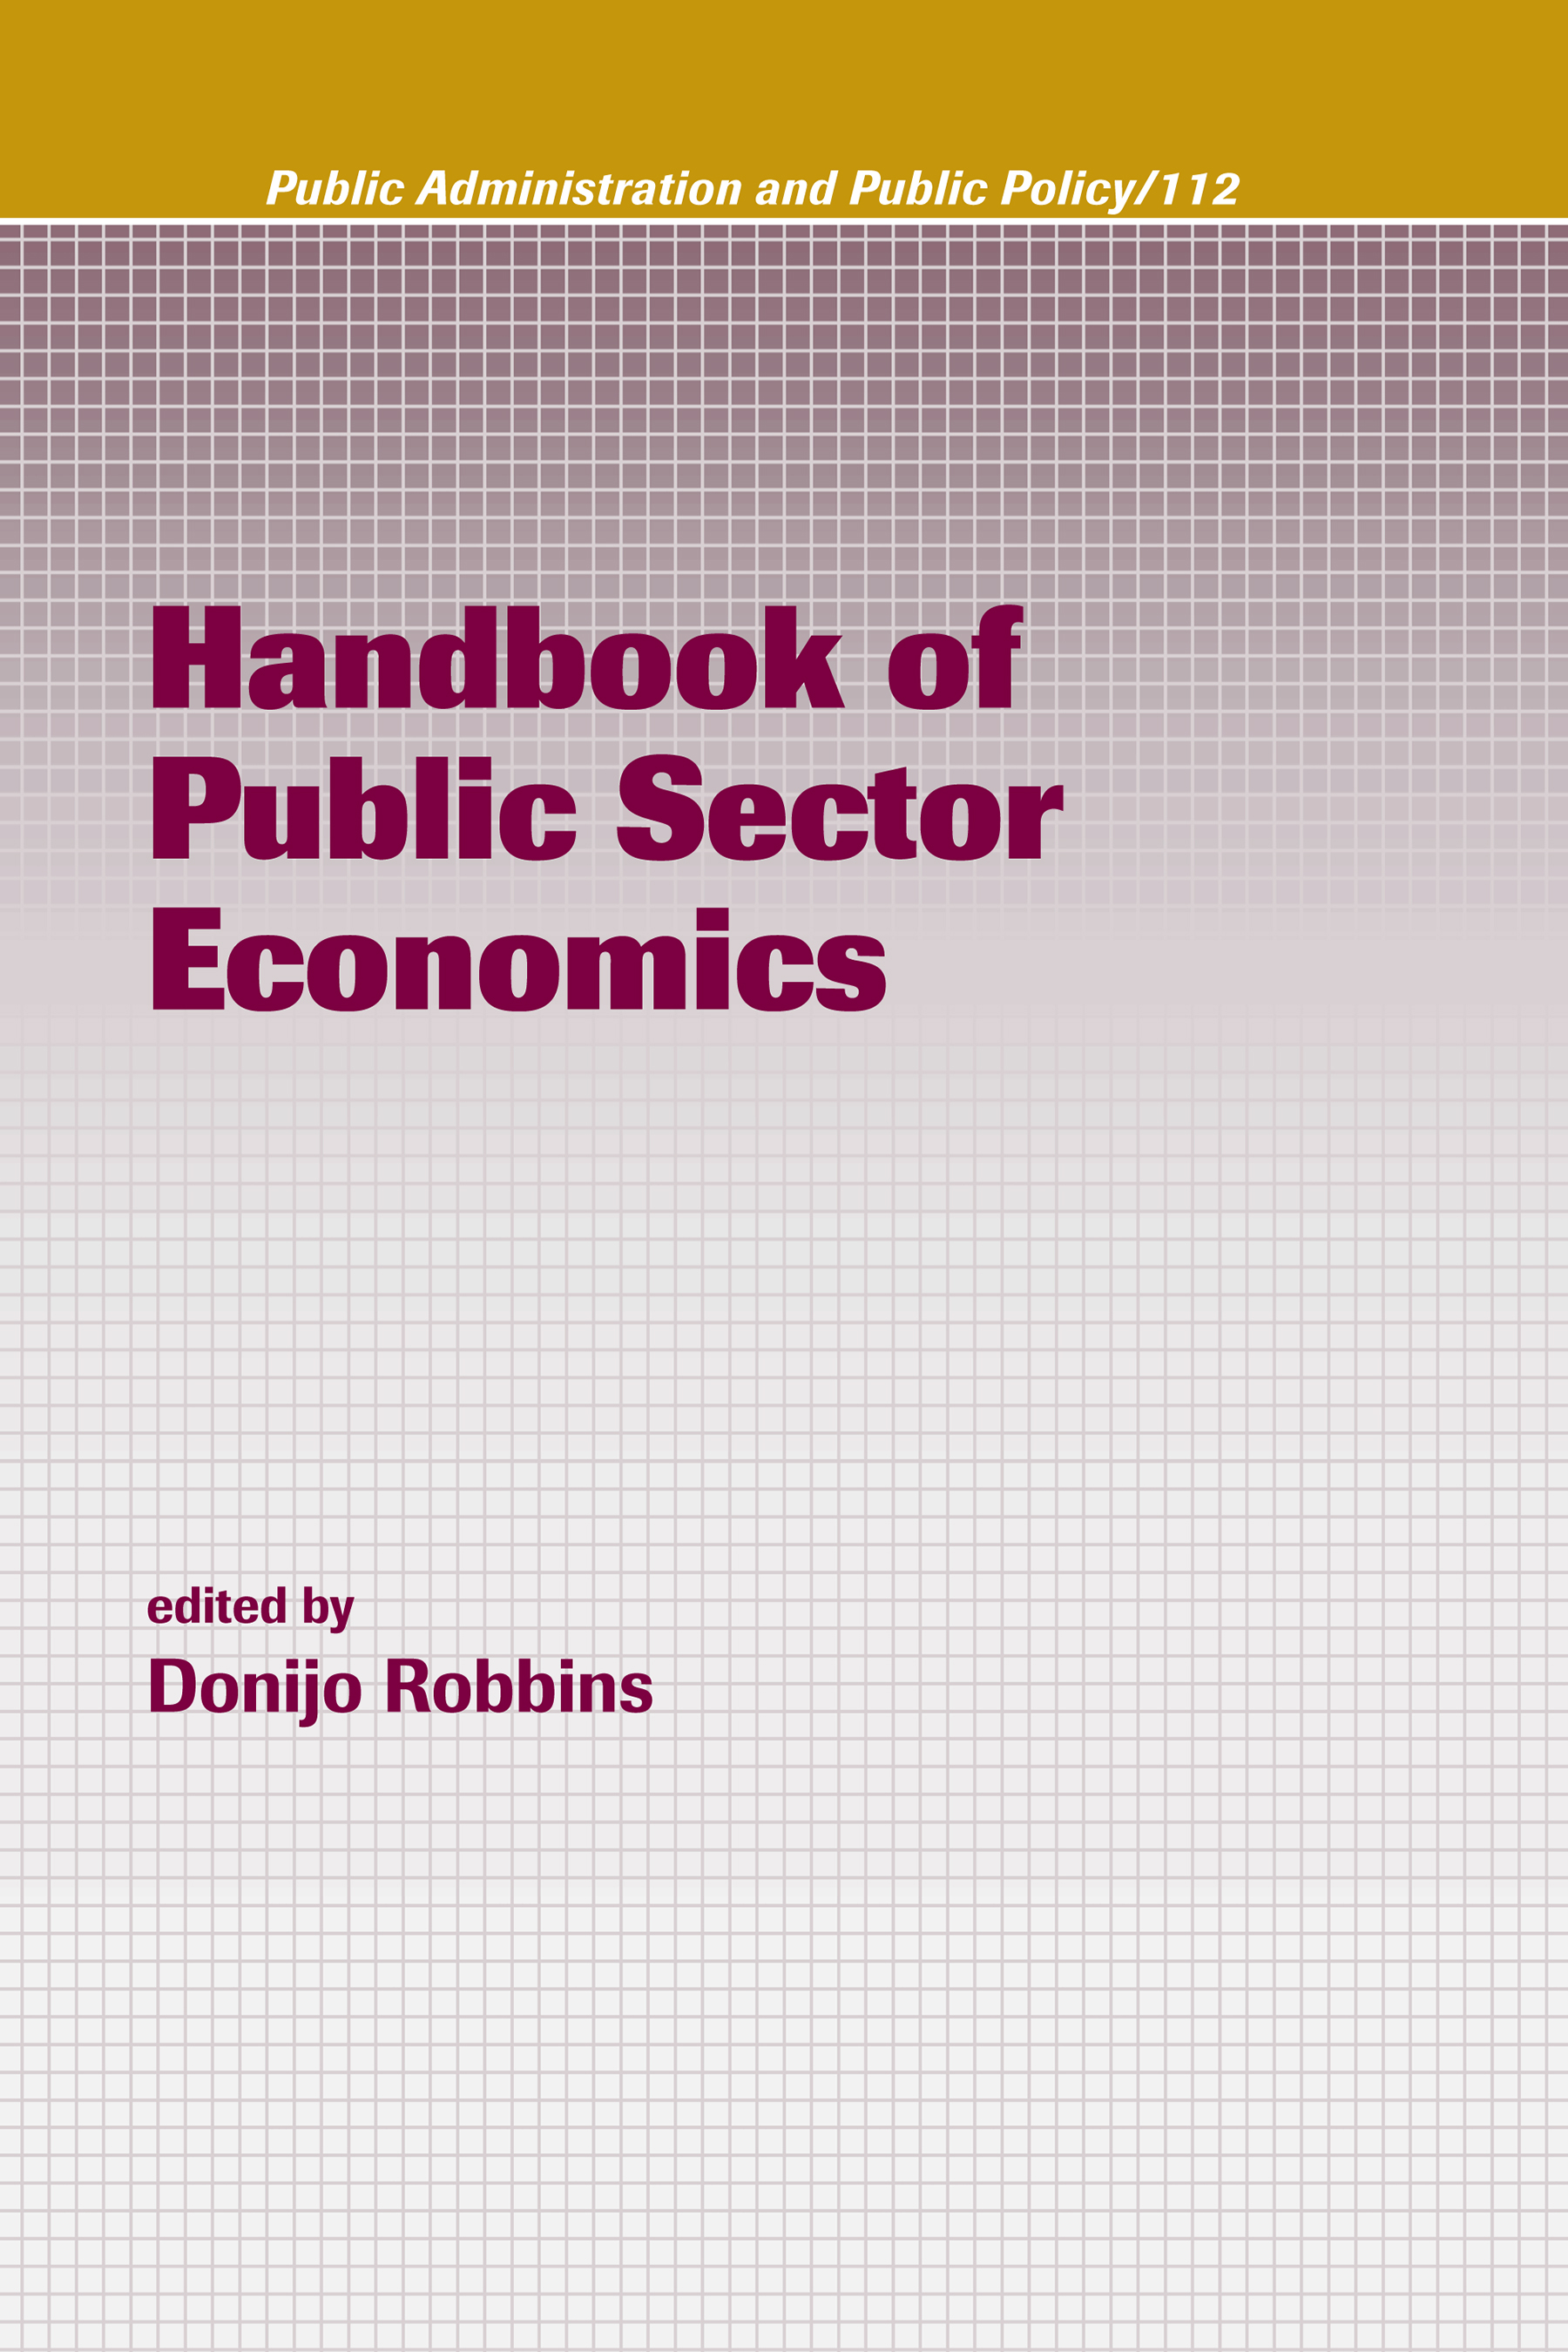 Handbook of Public Sector Economics: 1st Edition (Hardback) book cover